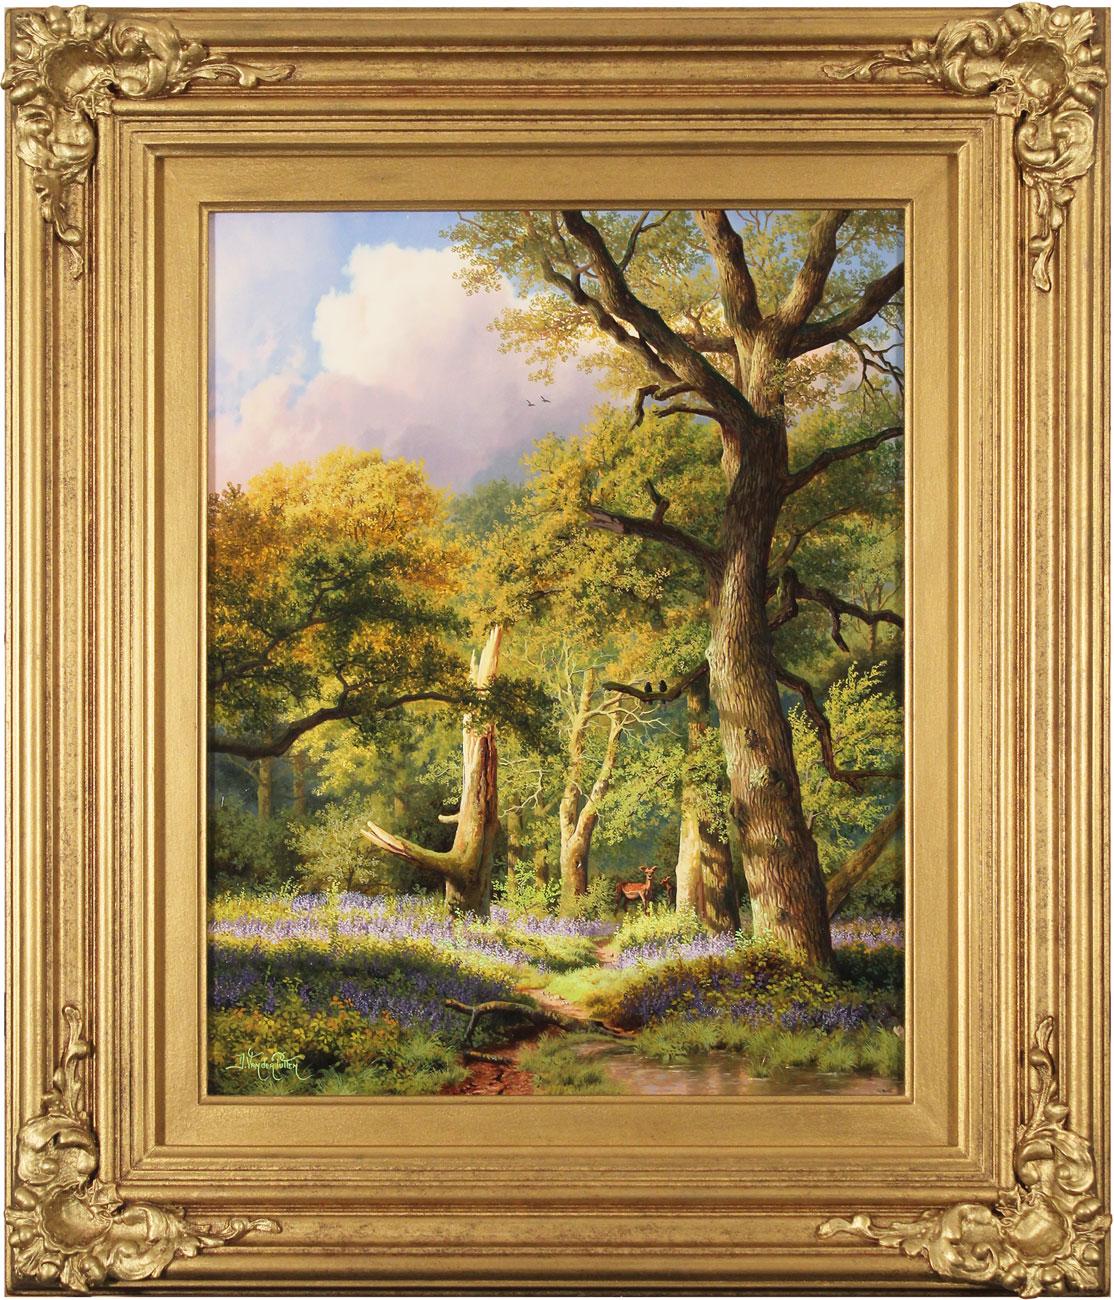 Daniel Van Der Putten, Original oil painting on panel, May in Beverley Woods, Yorkshire, click to enlarge